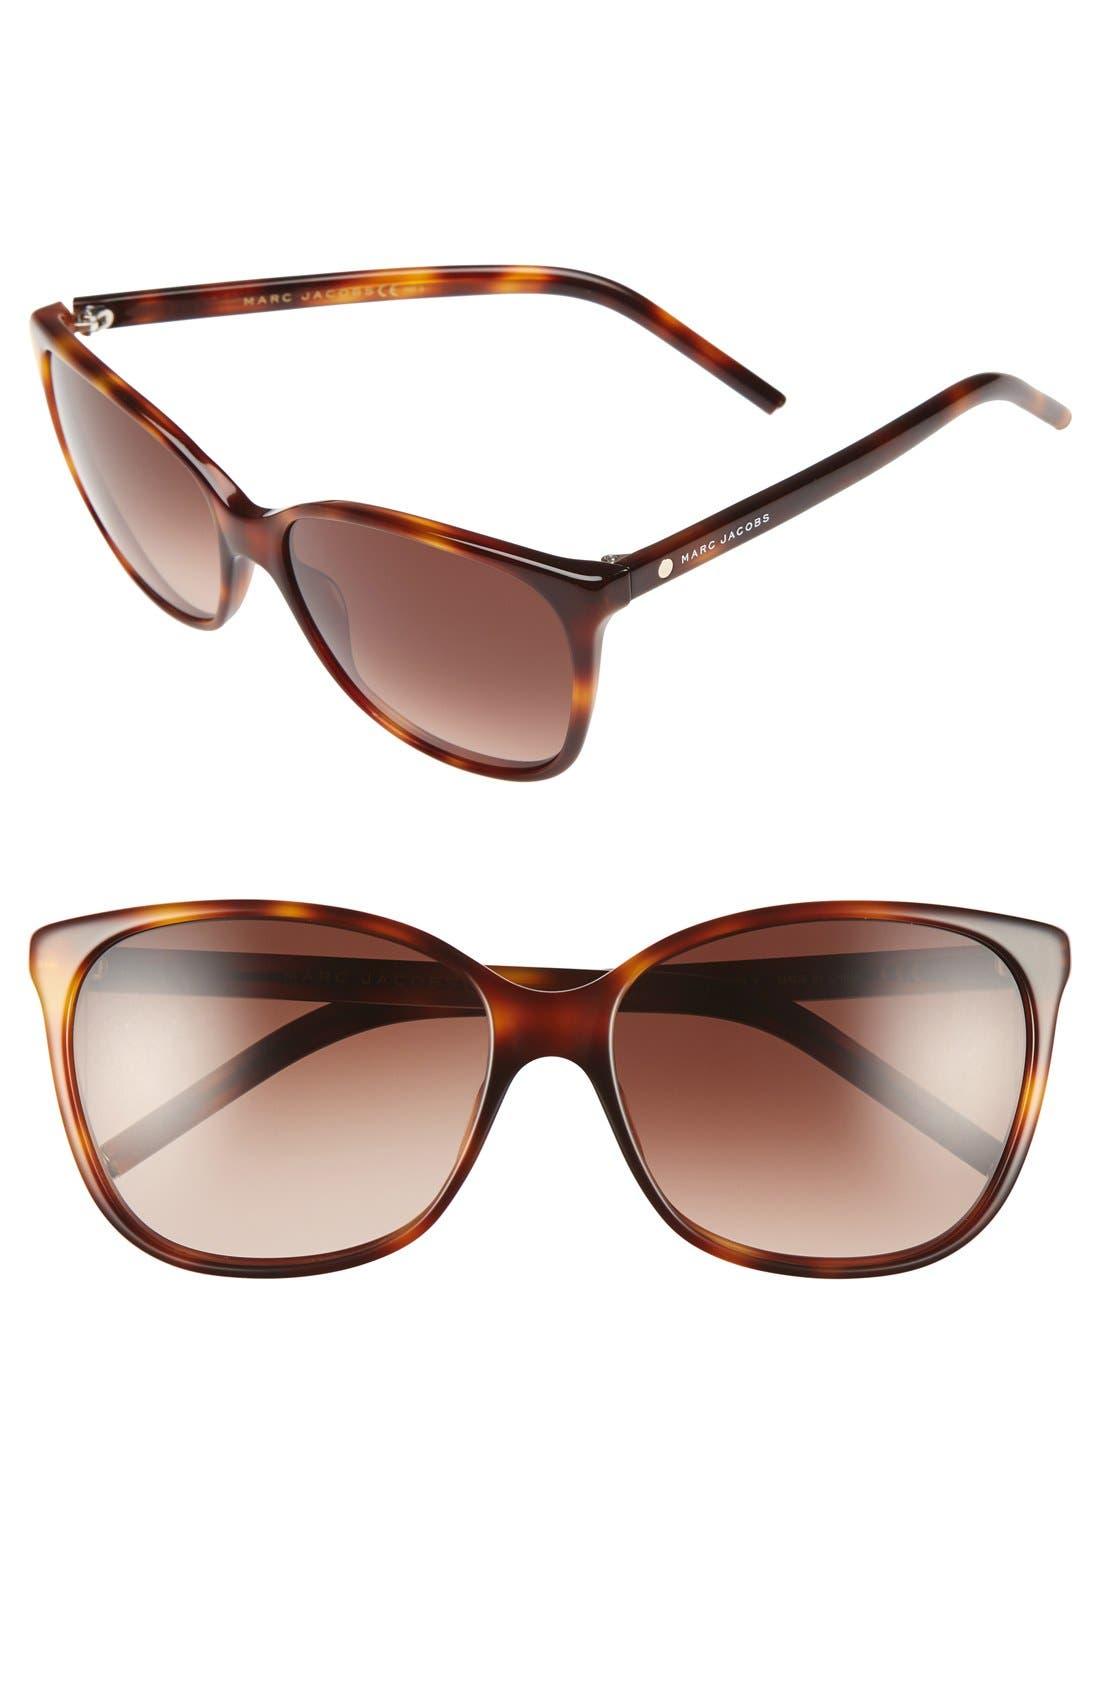 57mm Oversized Sunglasses,                             Main thumbnail 1, color,                             HAVANA